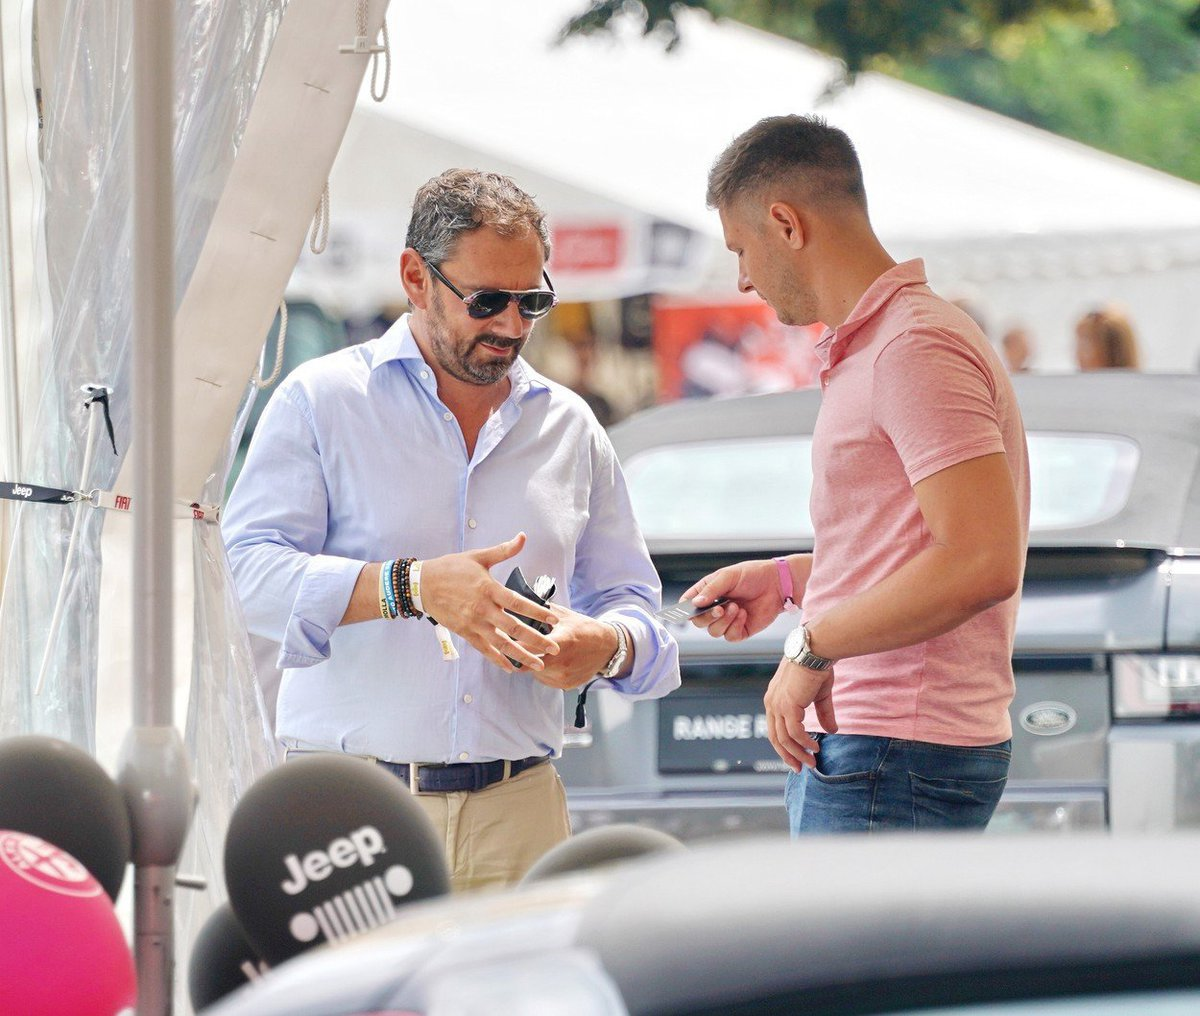 Emanuele Ridi se domlouval s prodejcem